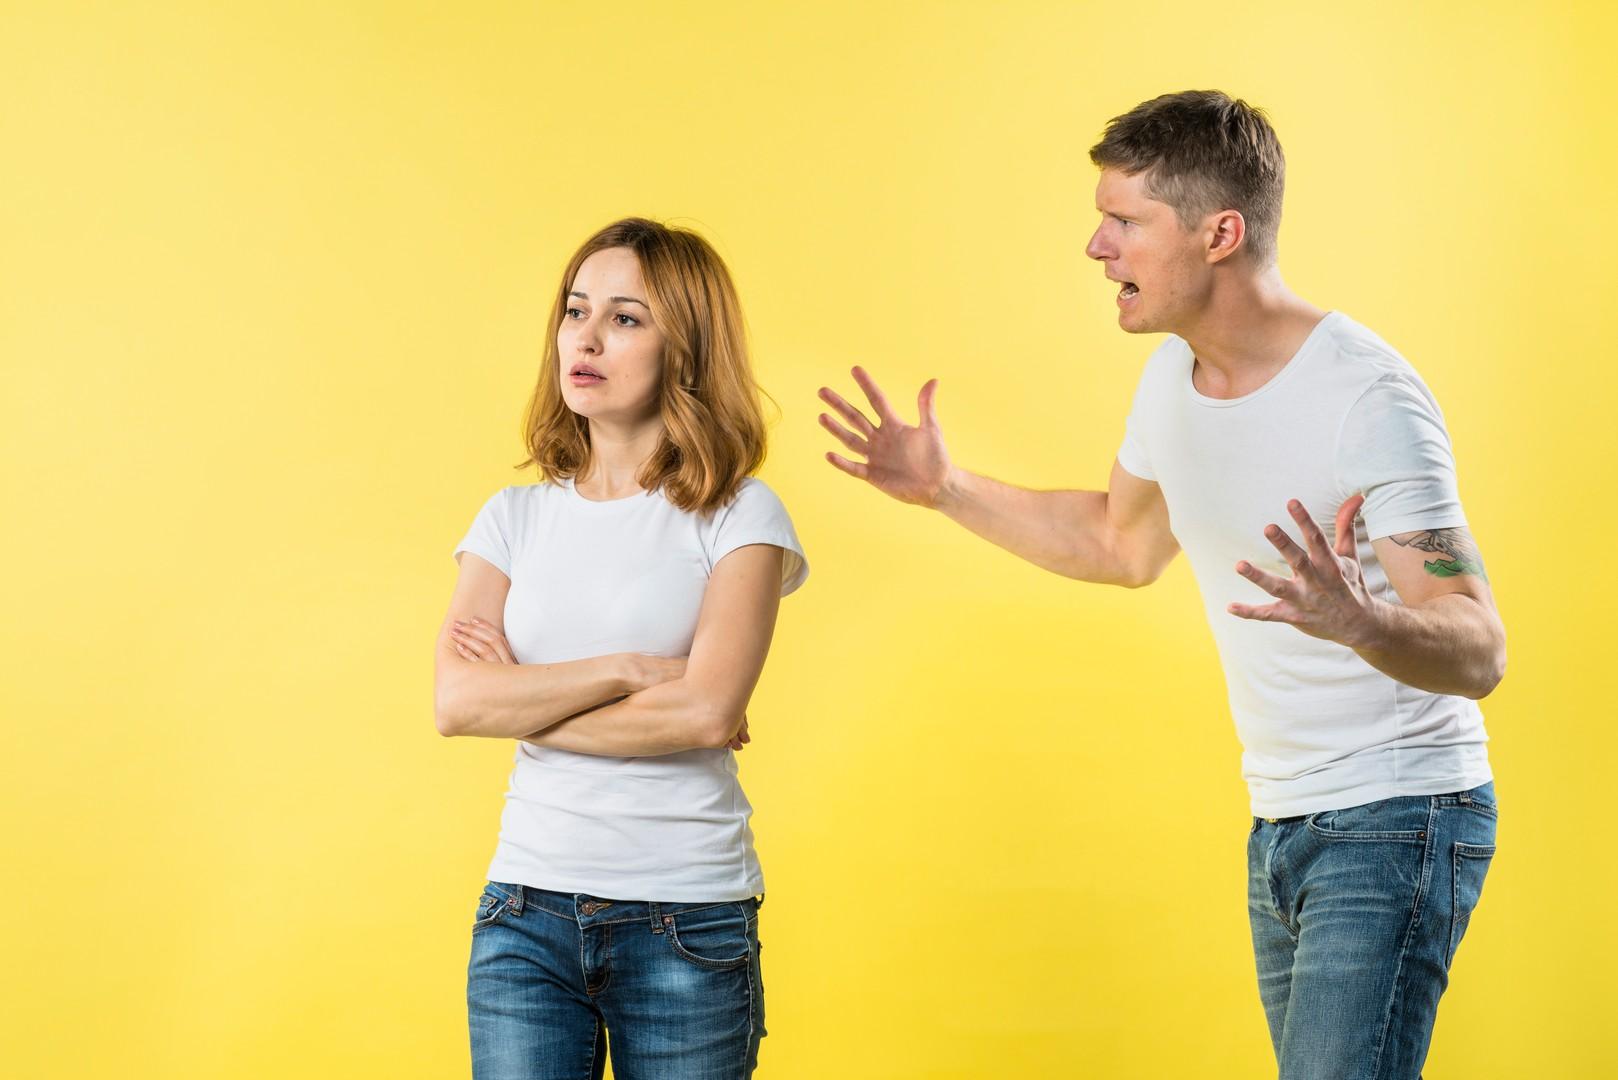 Муж постоянно орет и всем недоволен: совет психолога  от Plachu.Net